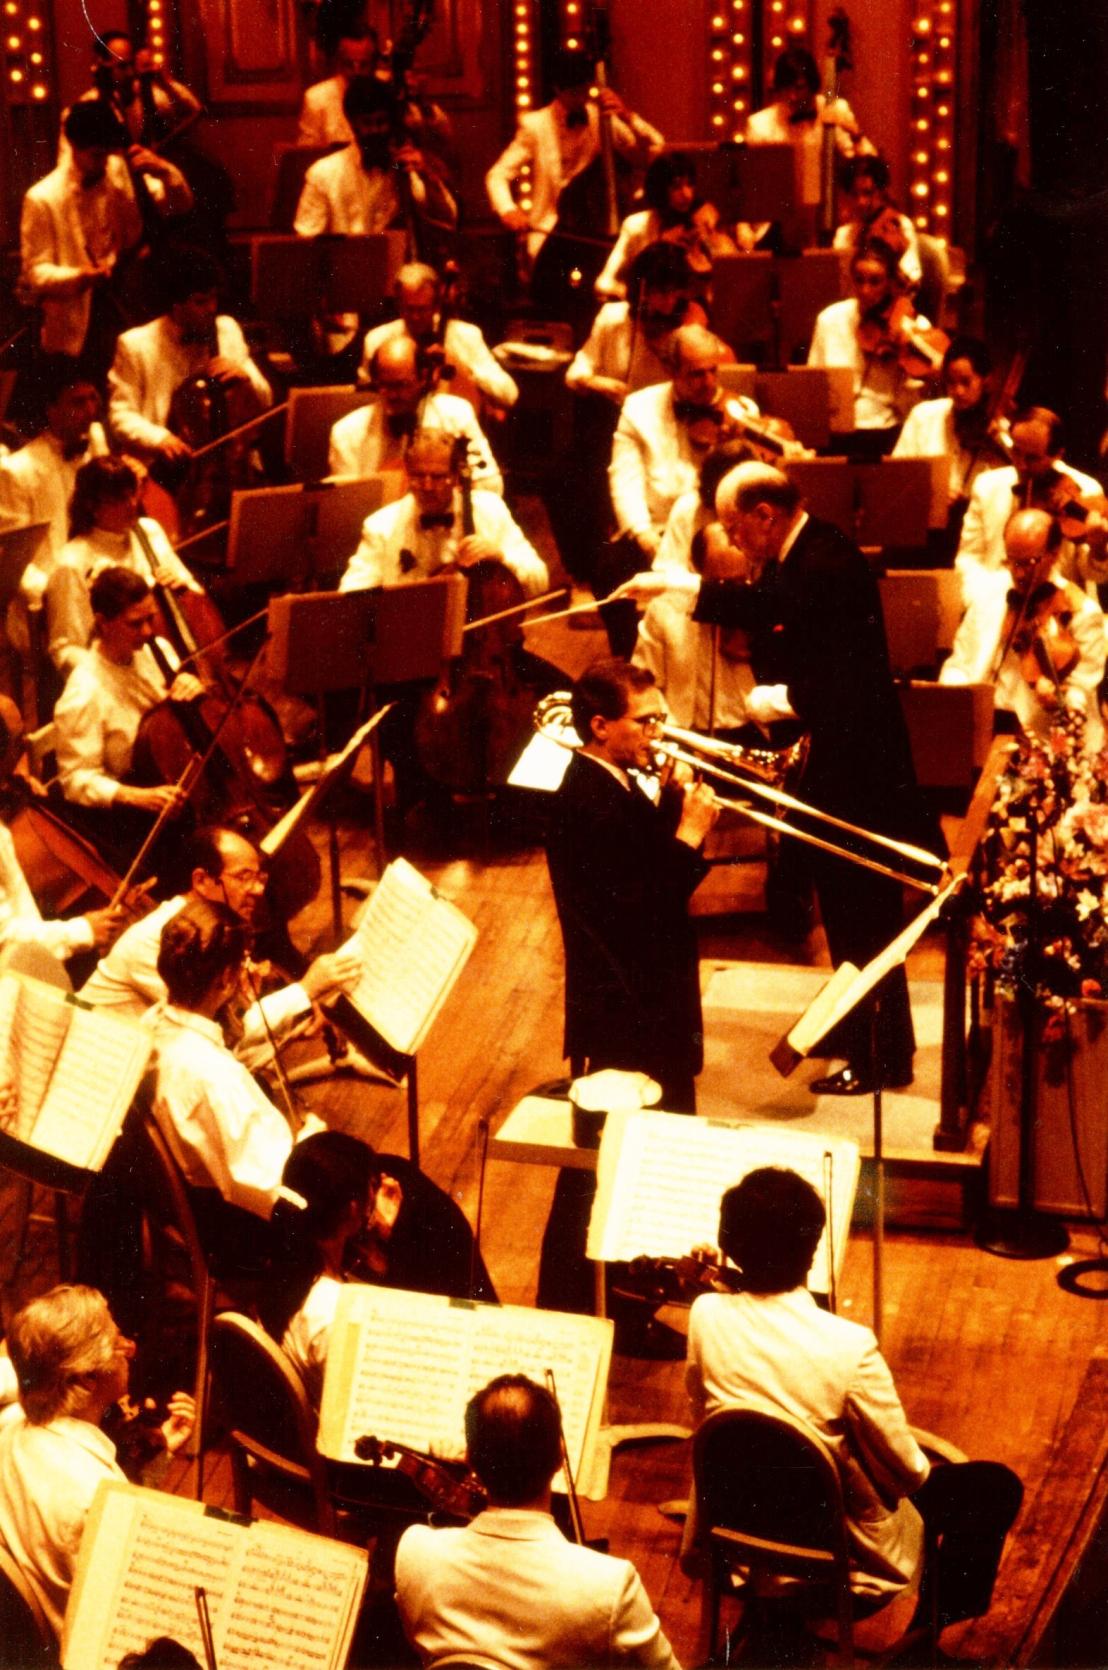 Yeo_Williams_Concerto_1991_05_24_ed